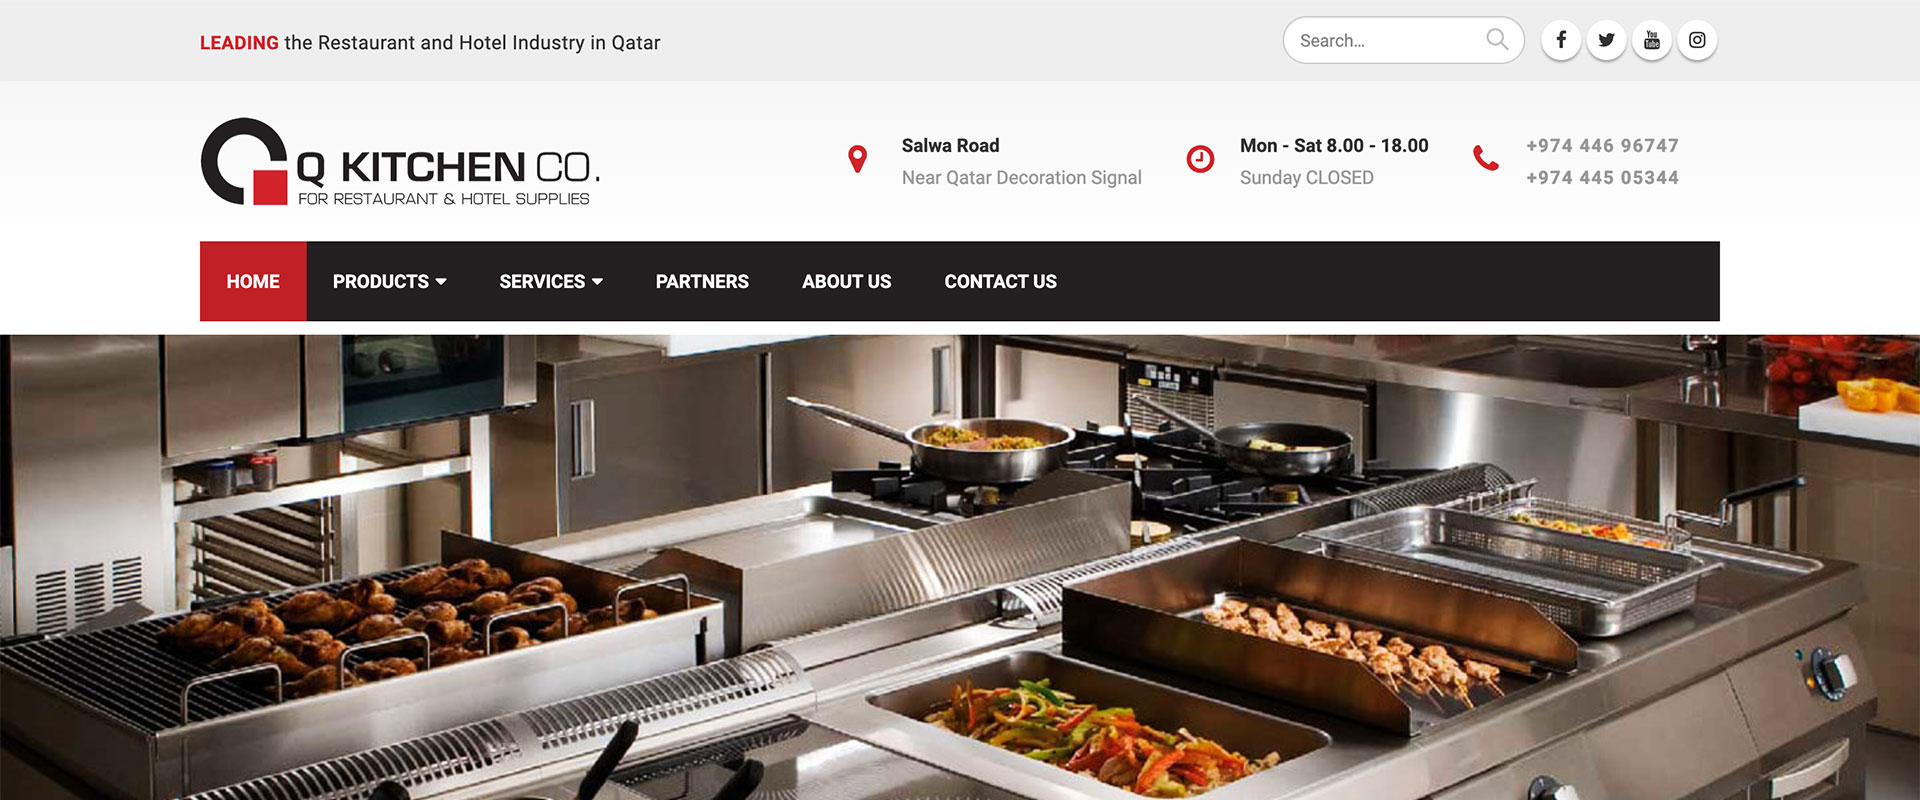 Q Kitchen Co Qatar